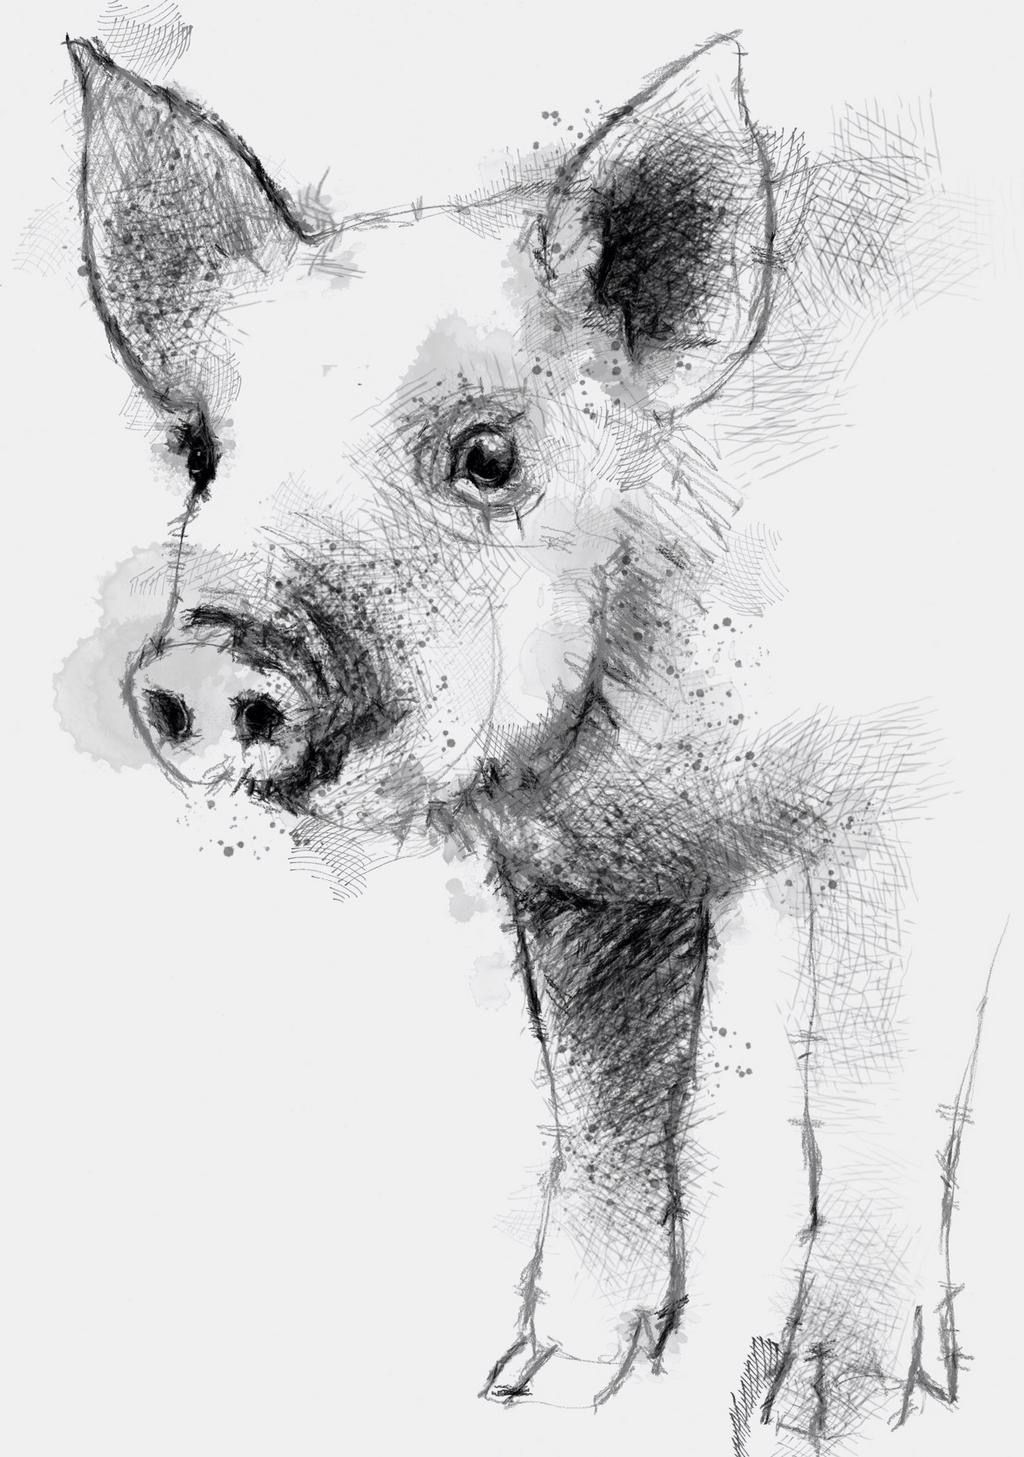 Twitter \'Piglet\' by @Sean_Briggs | 2-D Animal Art | Pinterest ...